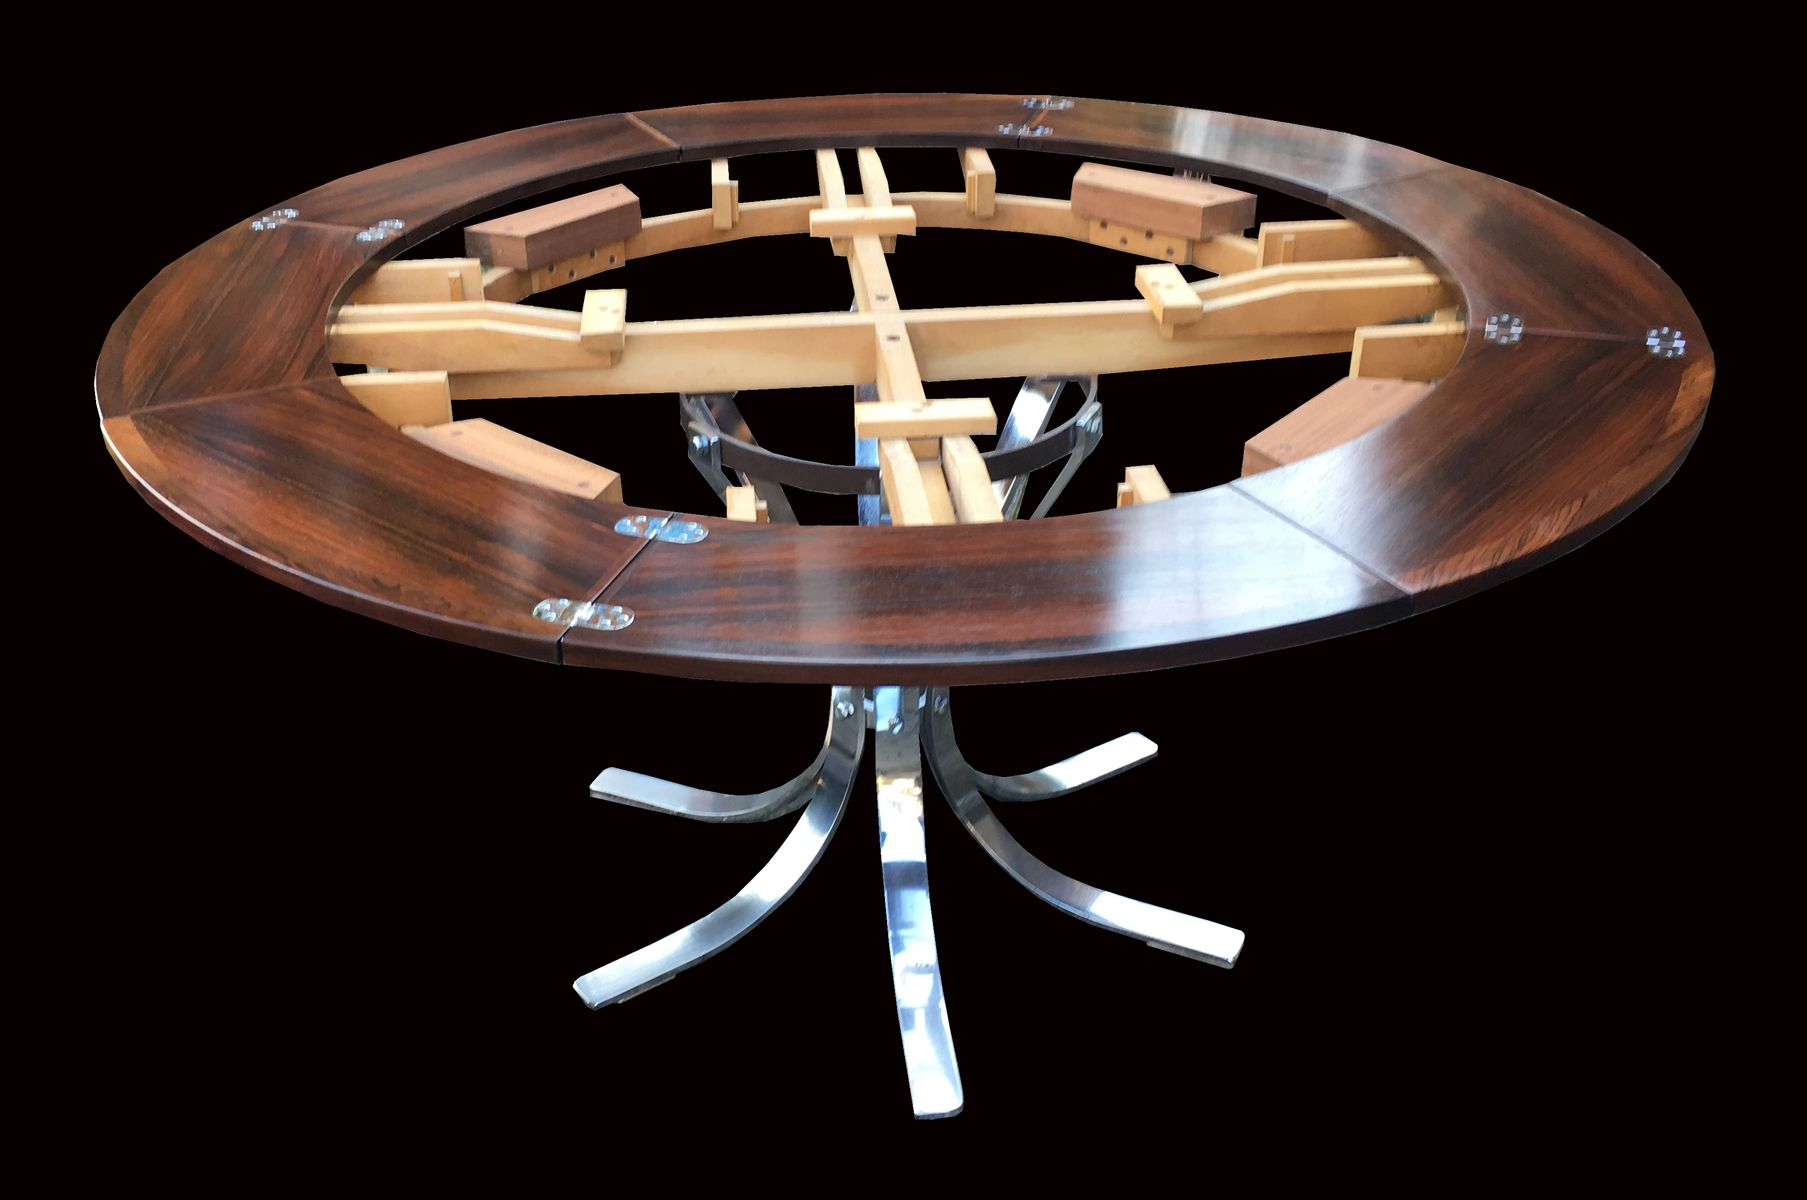 Table de salle manger ronde circulaire rallonge flip Table salle a manger originale